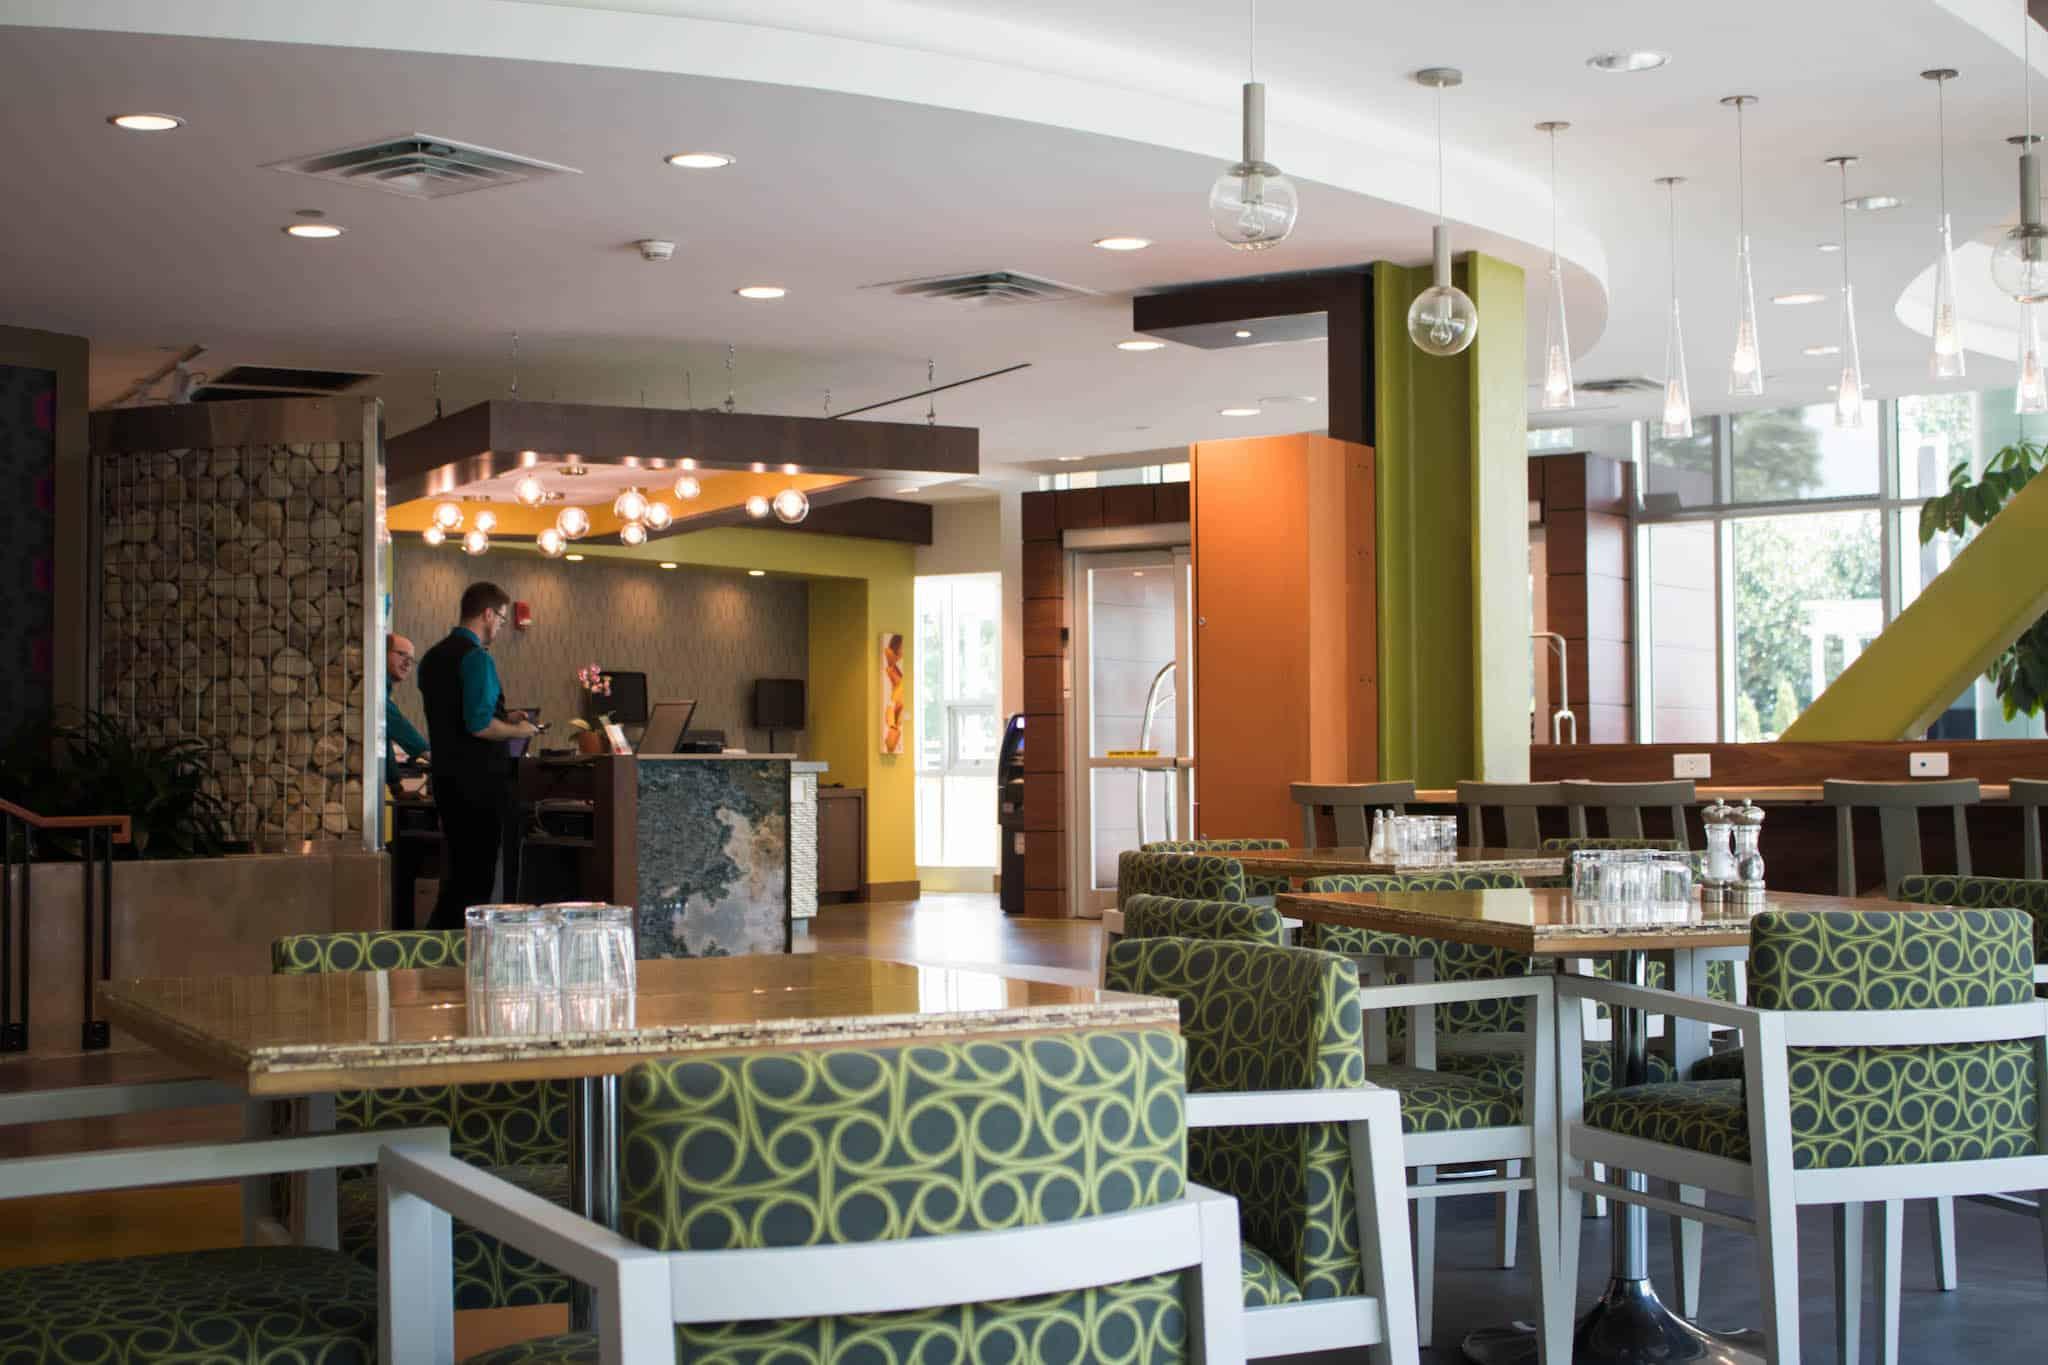 Hotel Indigo Romantic Things To Do Asheville